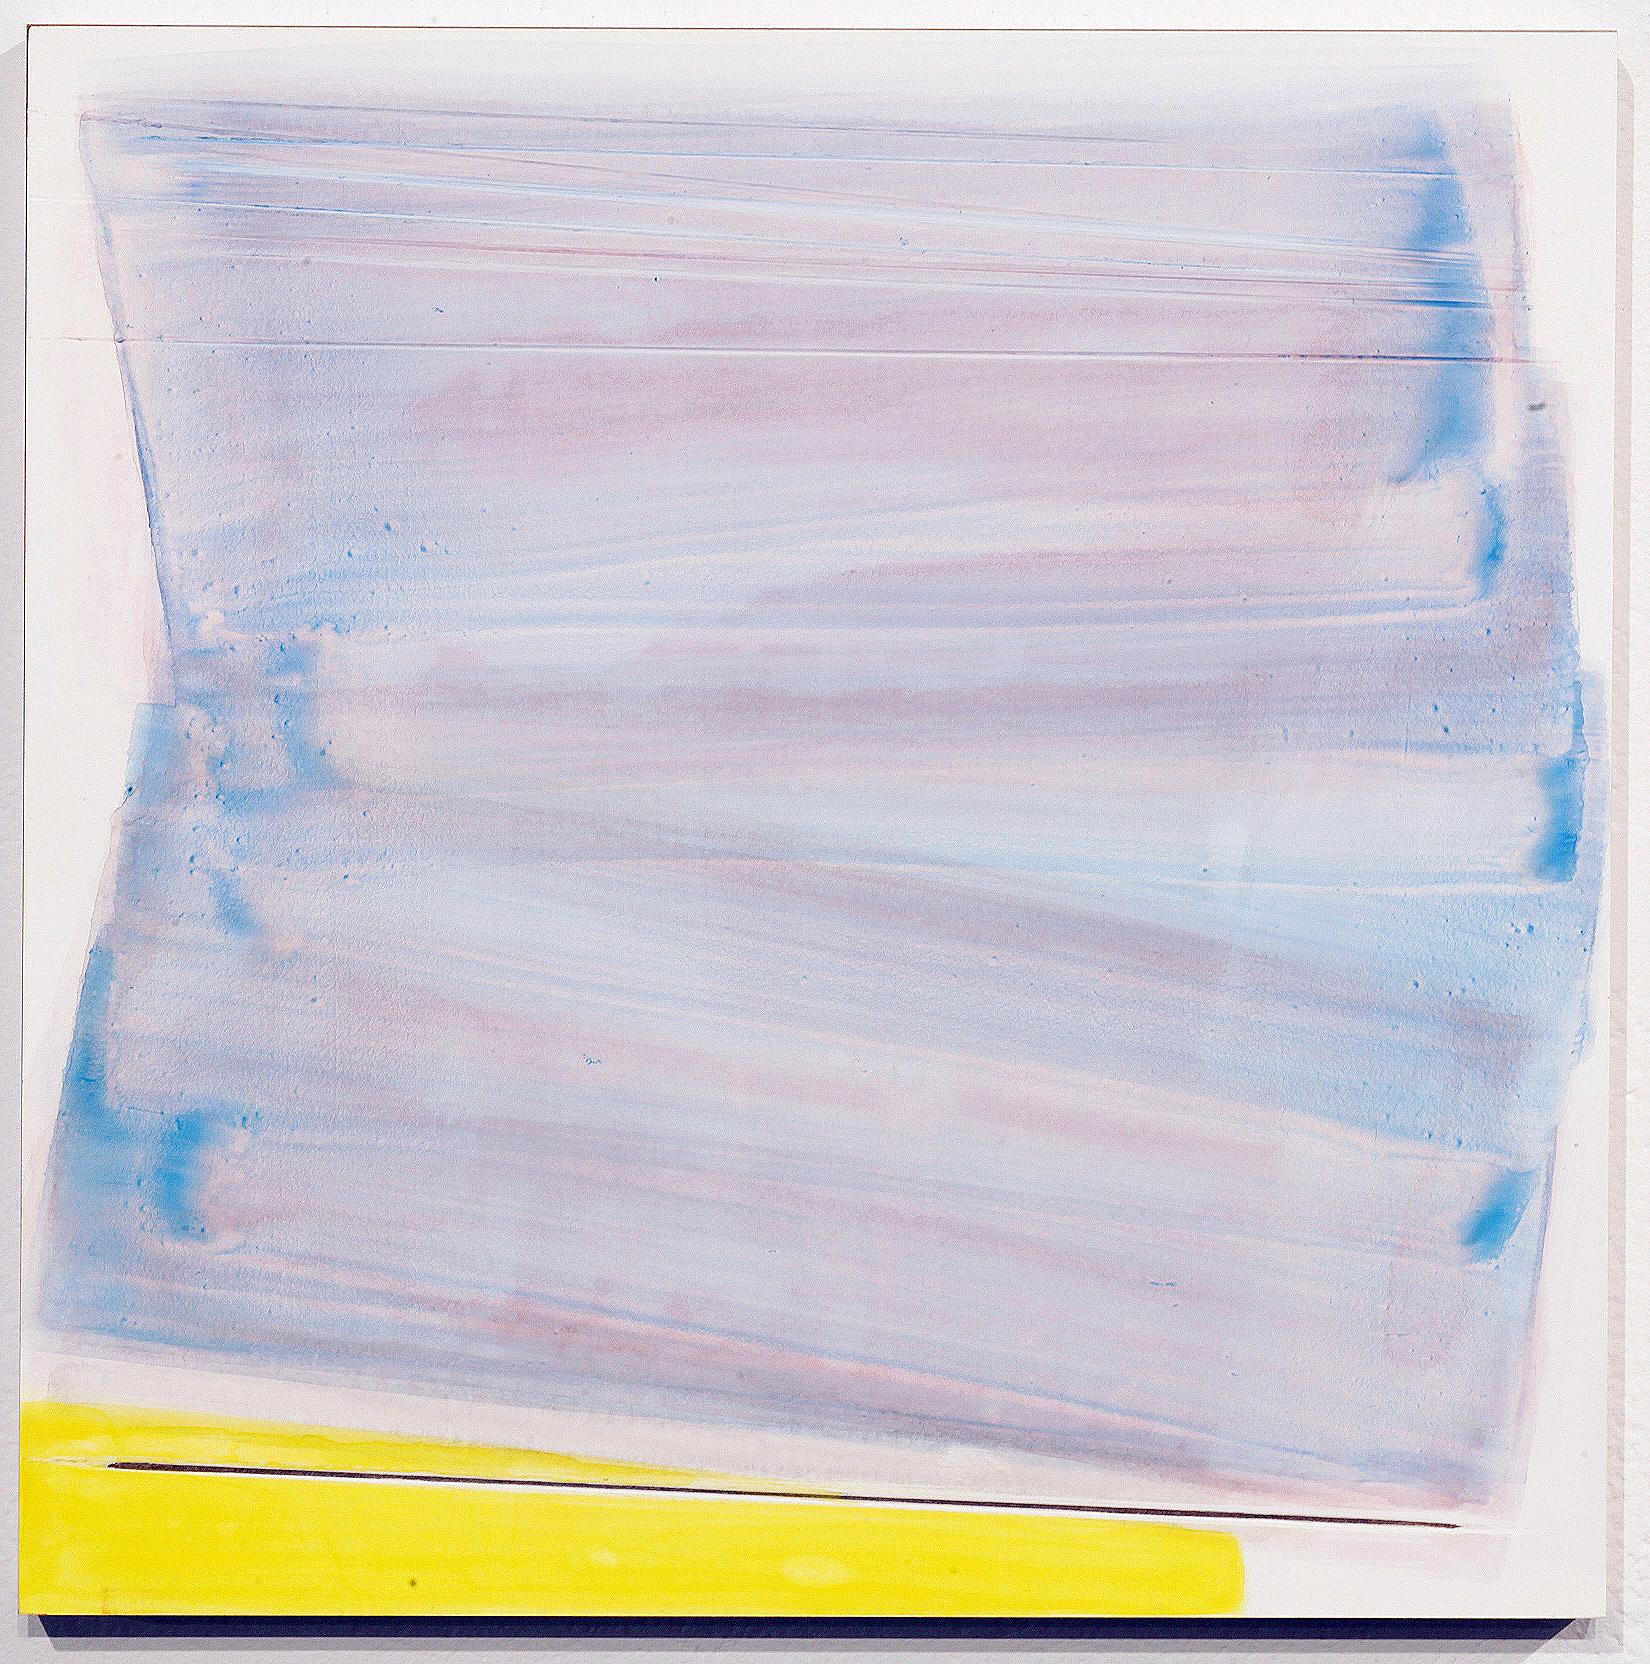 Untitled (yellow), 2012